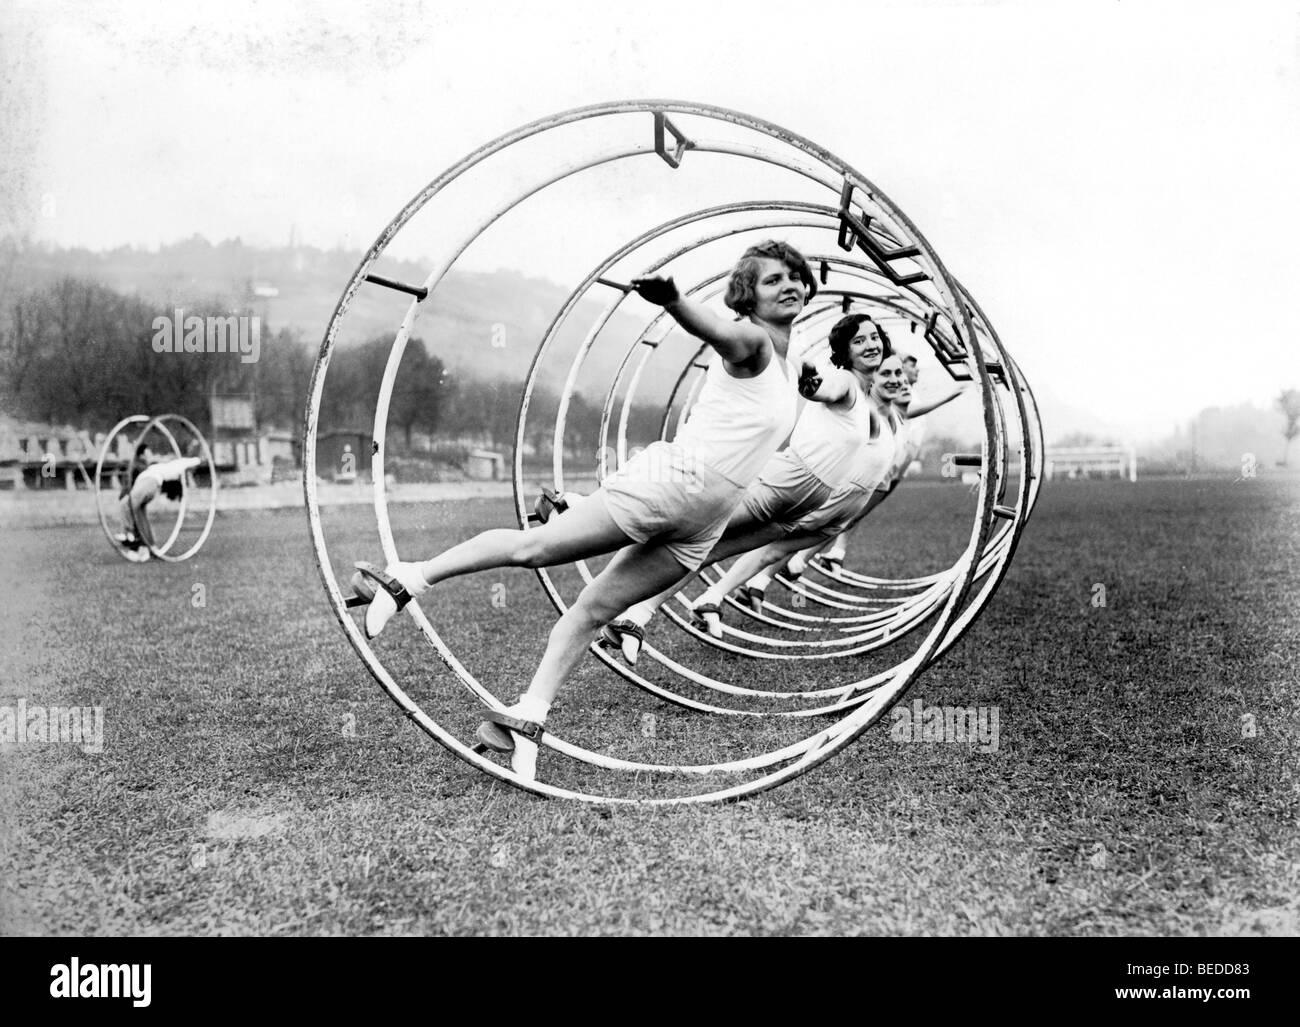 Historic photograph, women doing gymnastics, around 1929 - Stock Image